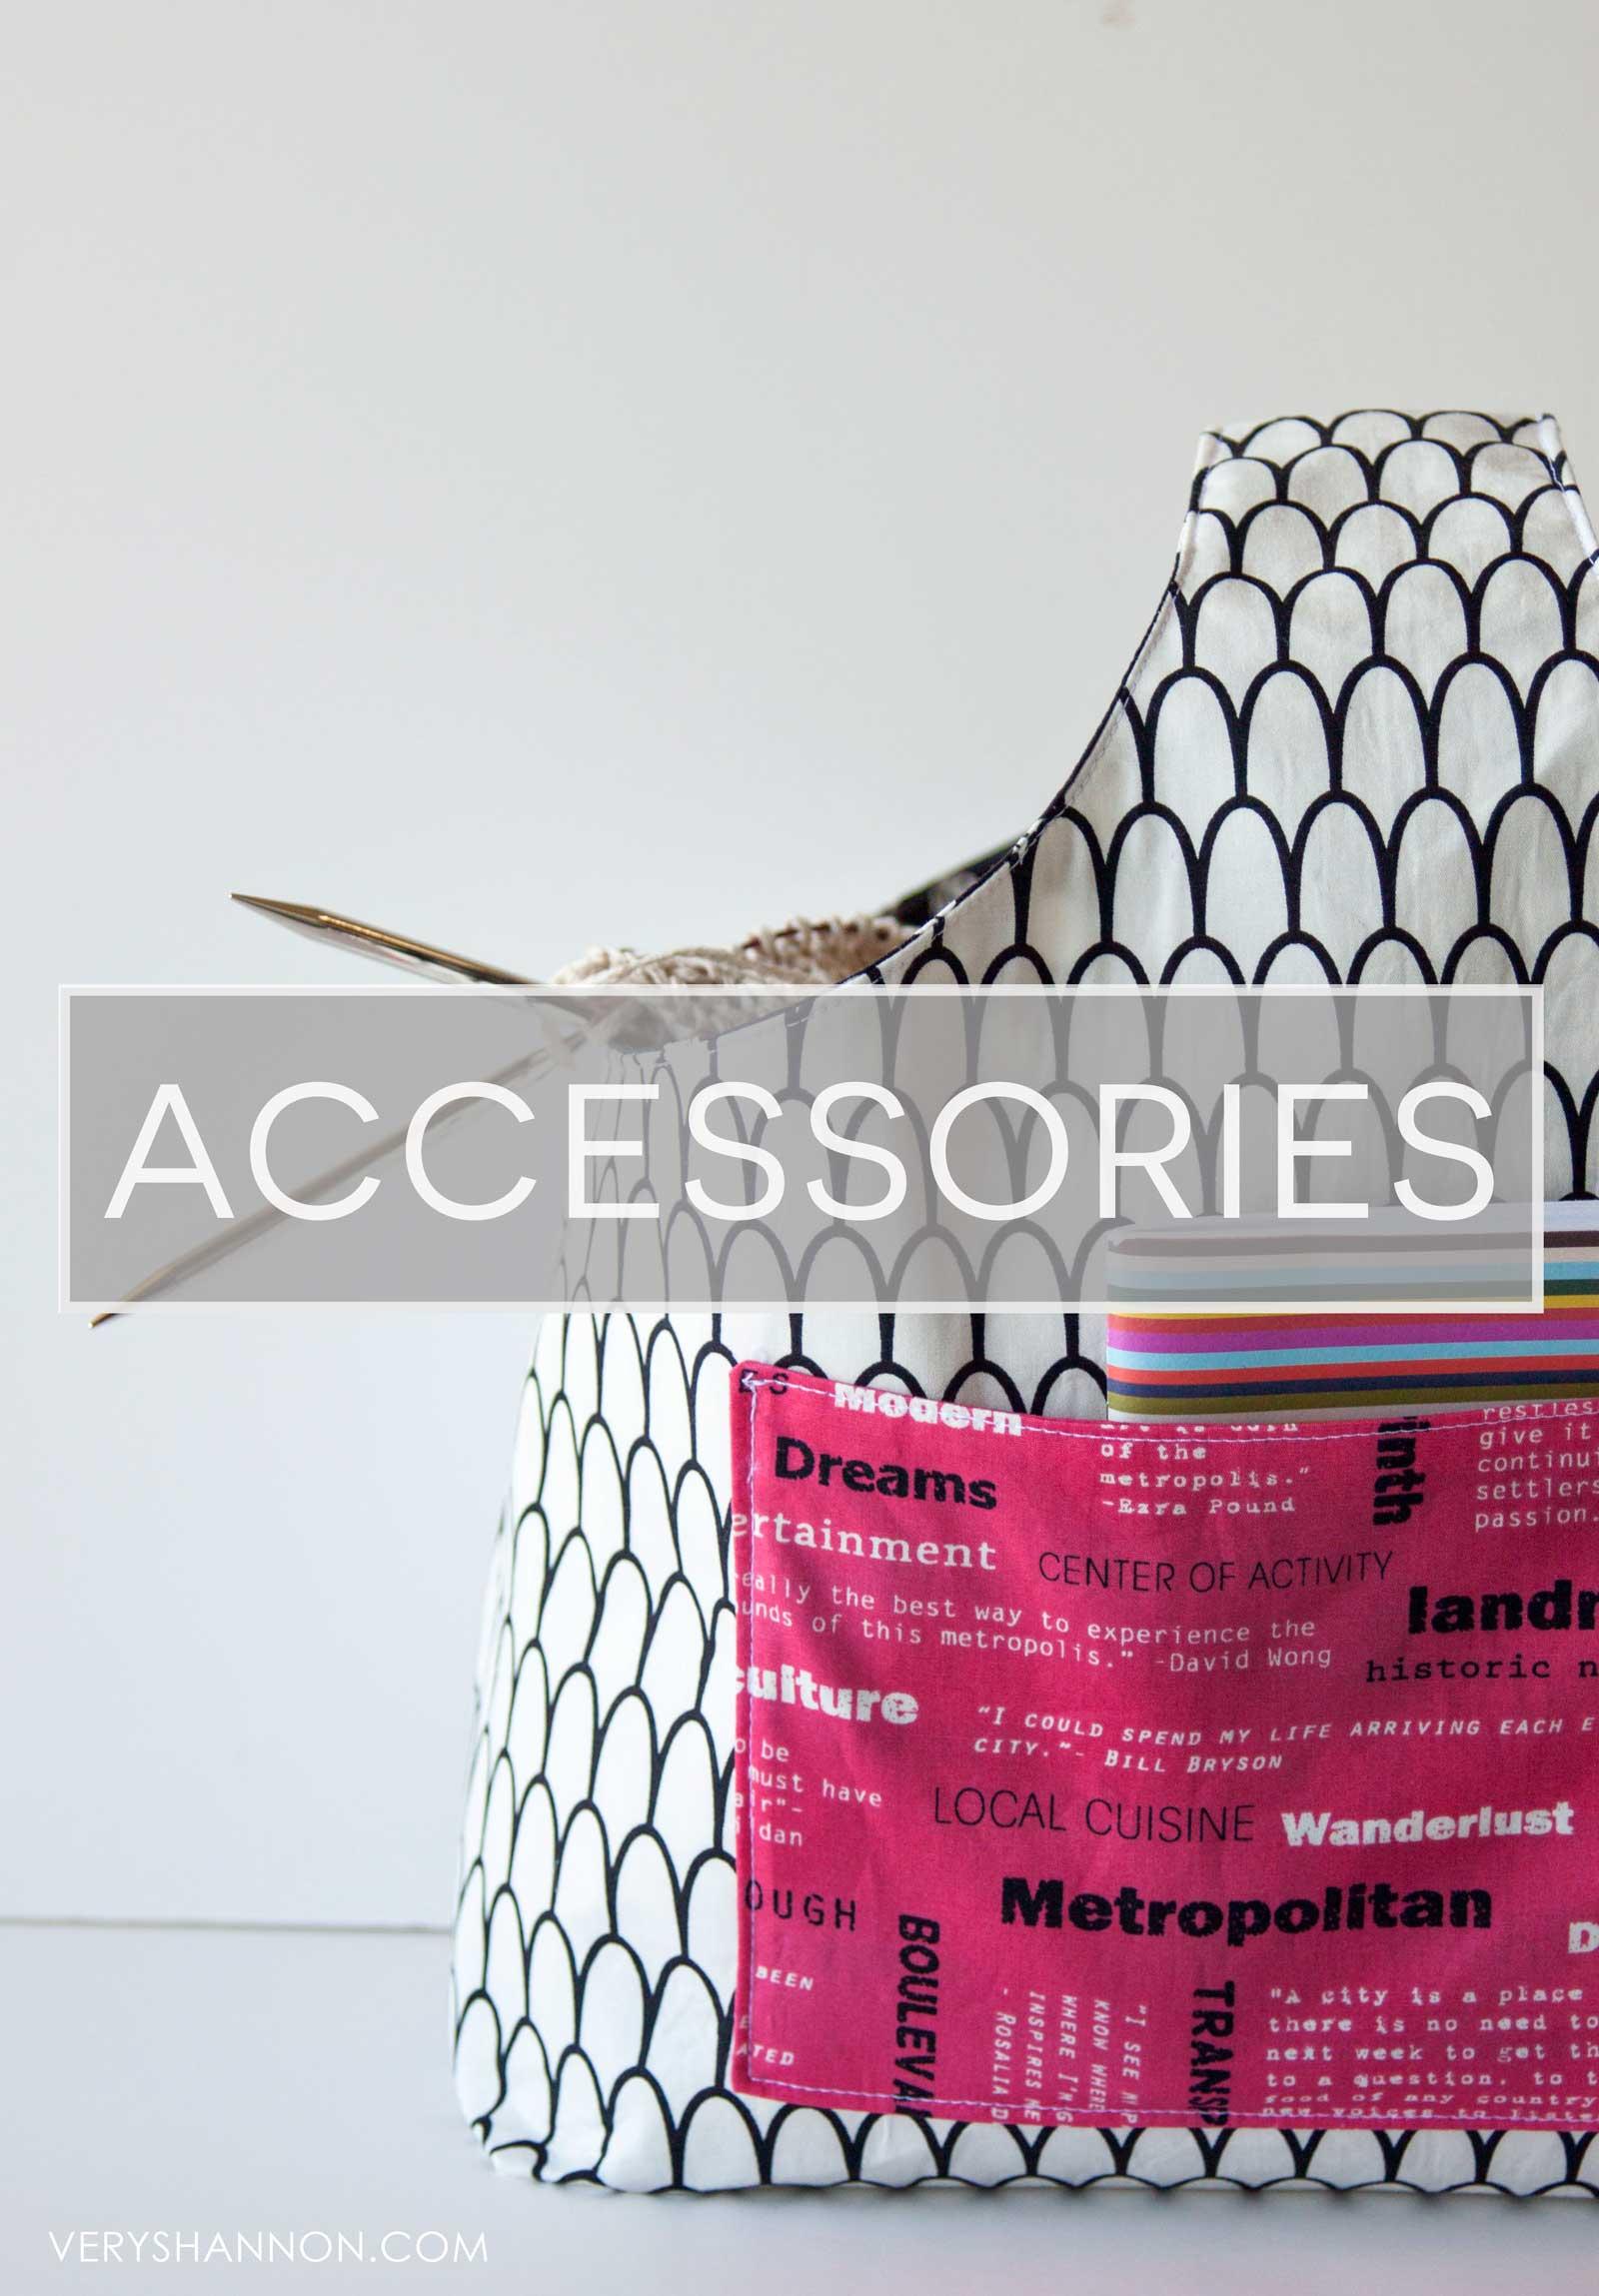 Accessory Tutorials on VeryShannon.com!